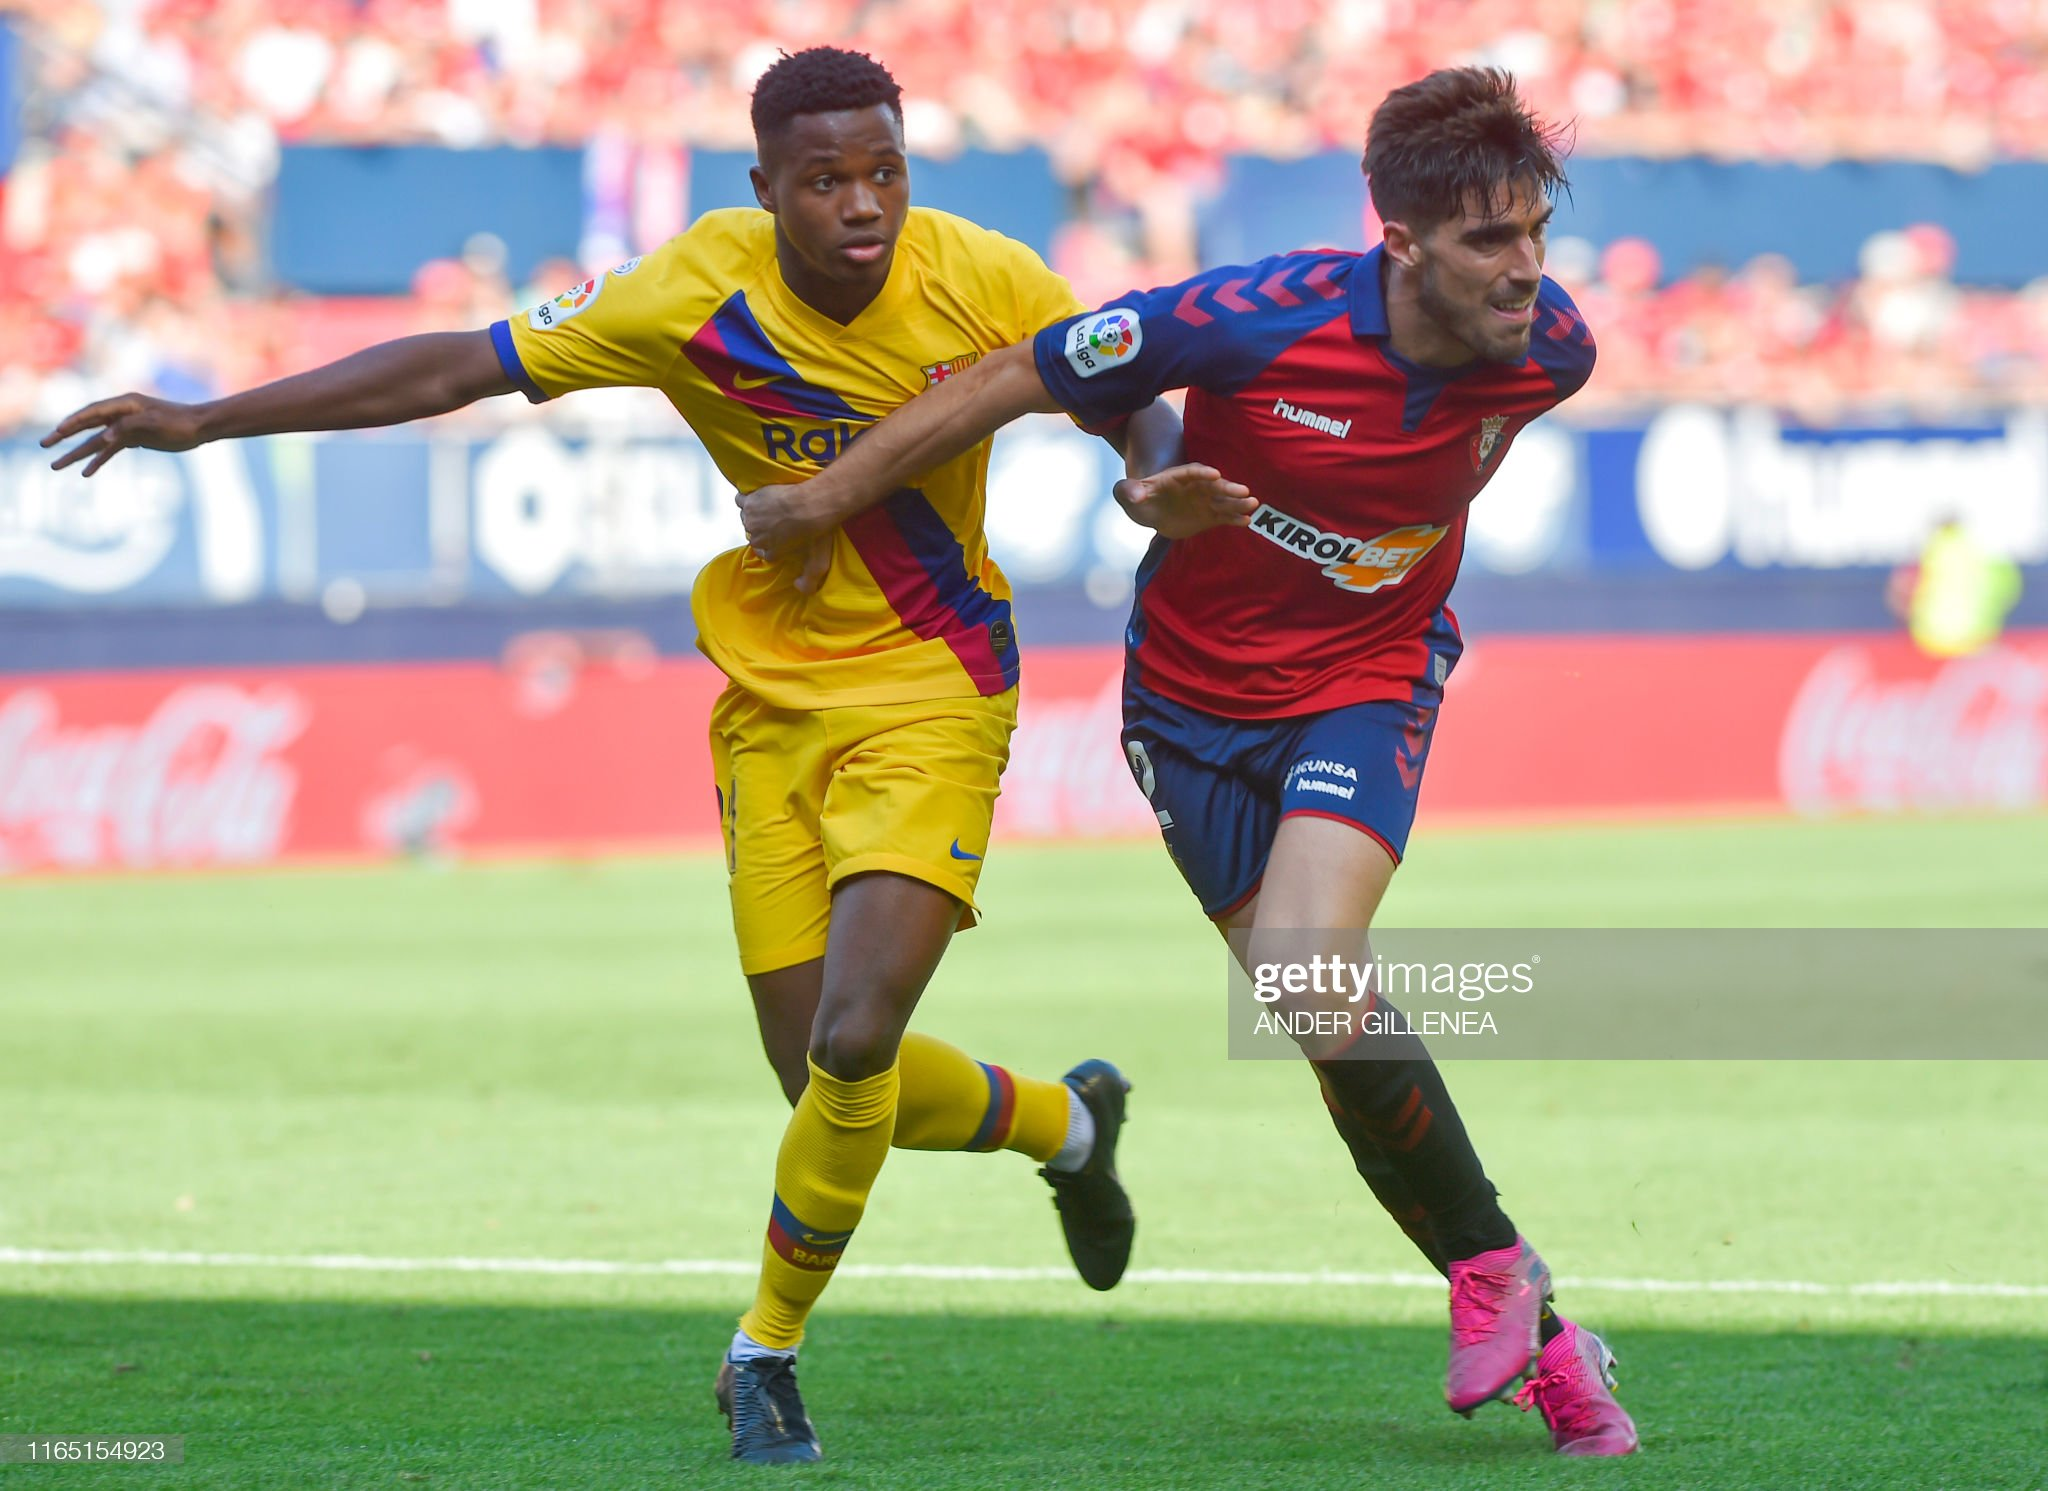 صور مباراة : أوساسونا - برشلونة 2-2 ( 31-08-2019 )  Barcelonas-guineabissau-forward-ansu-fati-challenges-osasunas-spanish-picture-id1165154923?s=2048x2048